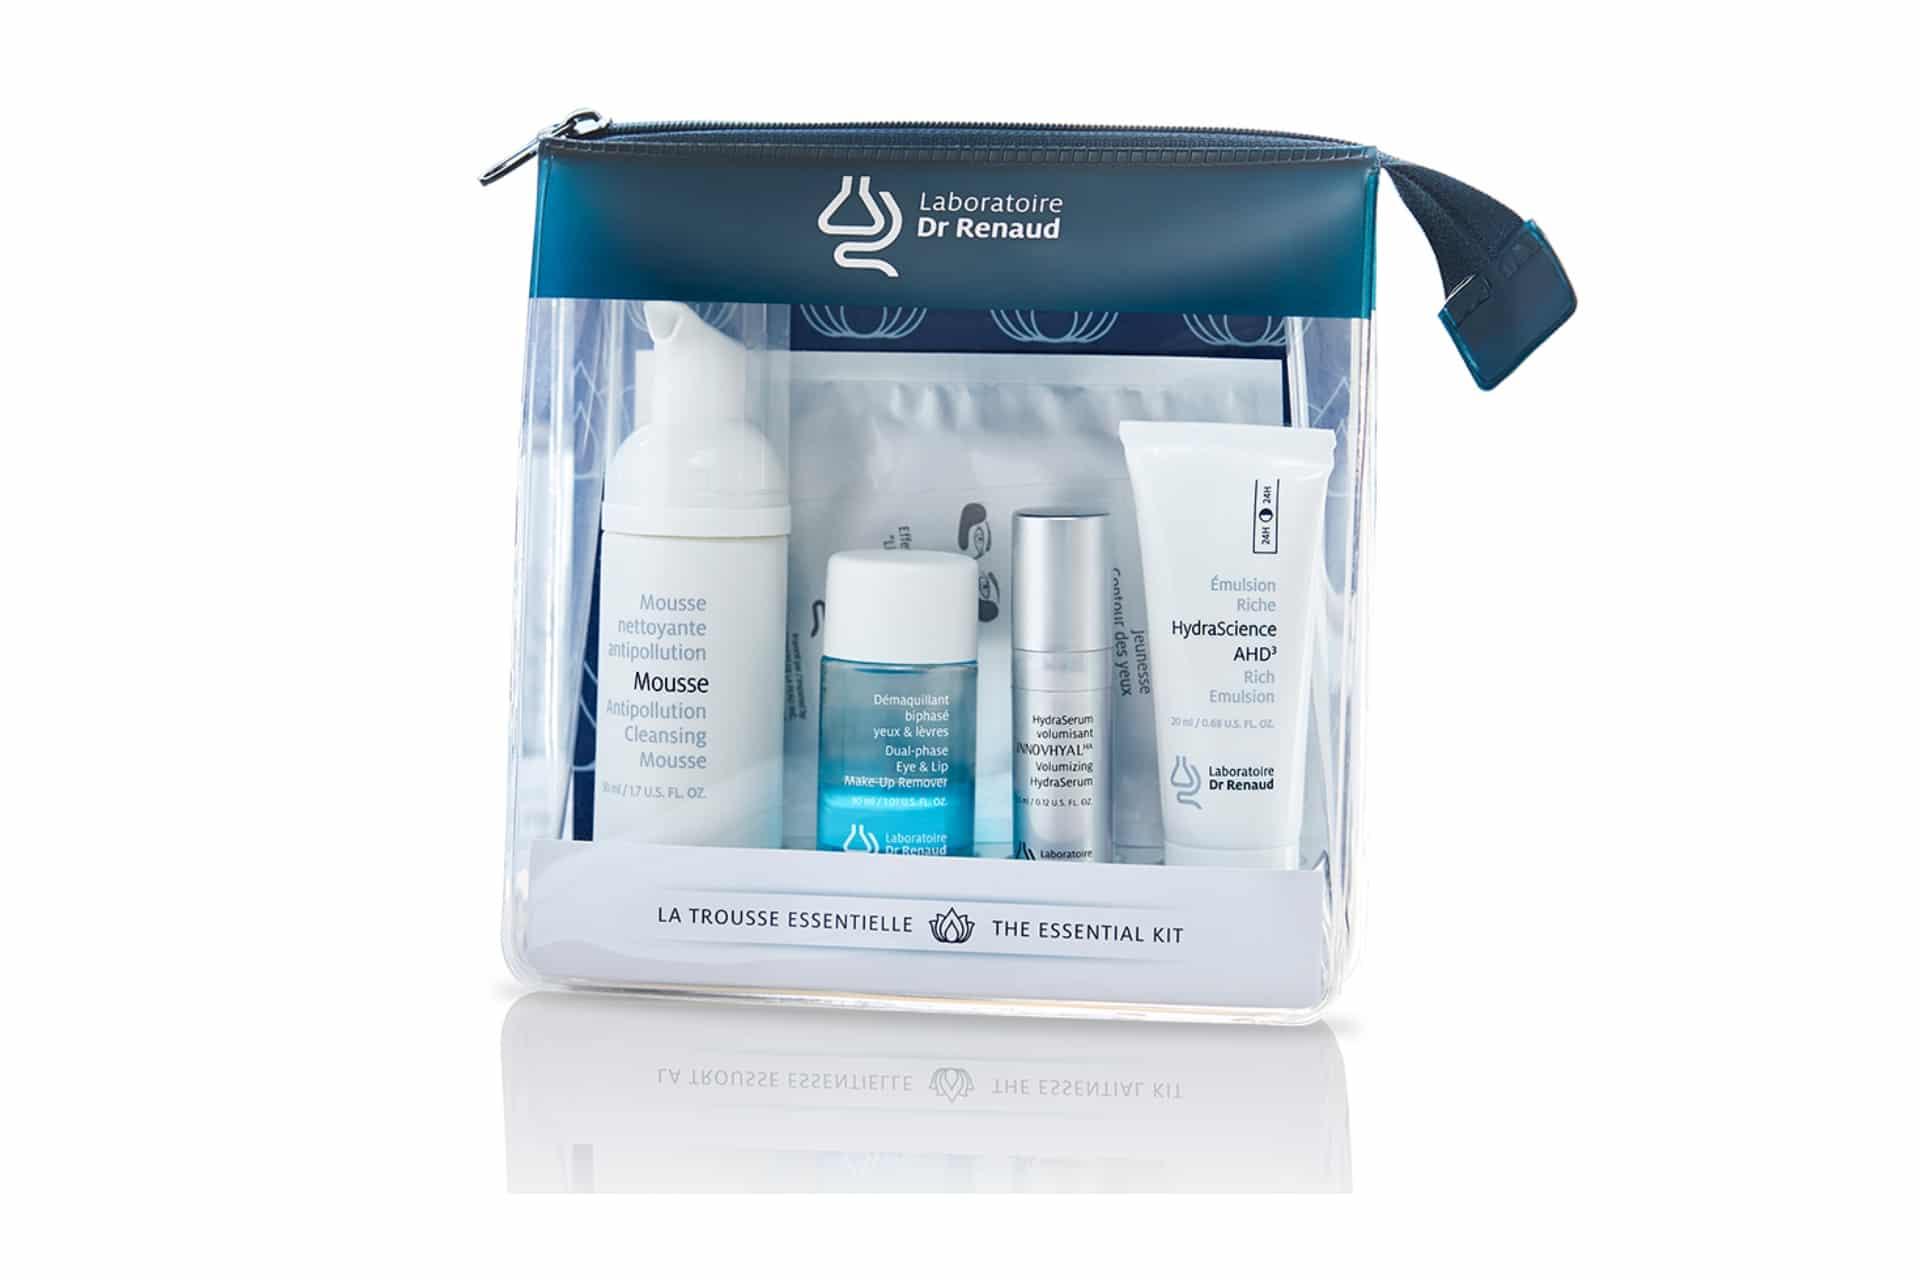 travel-size kit of skincare